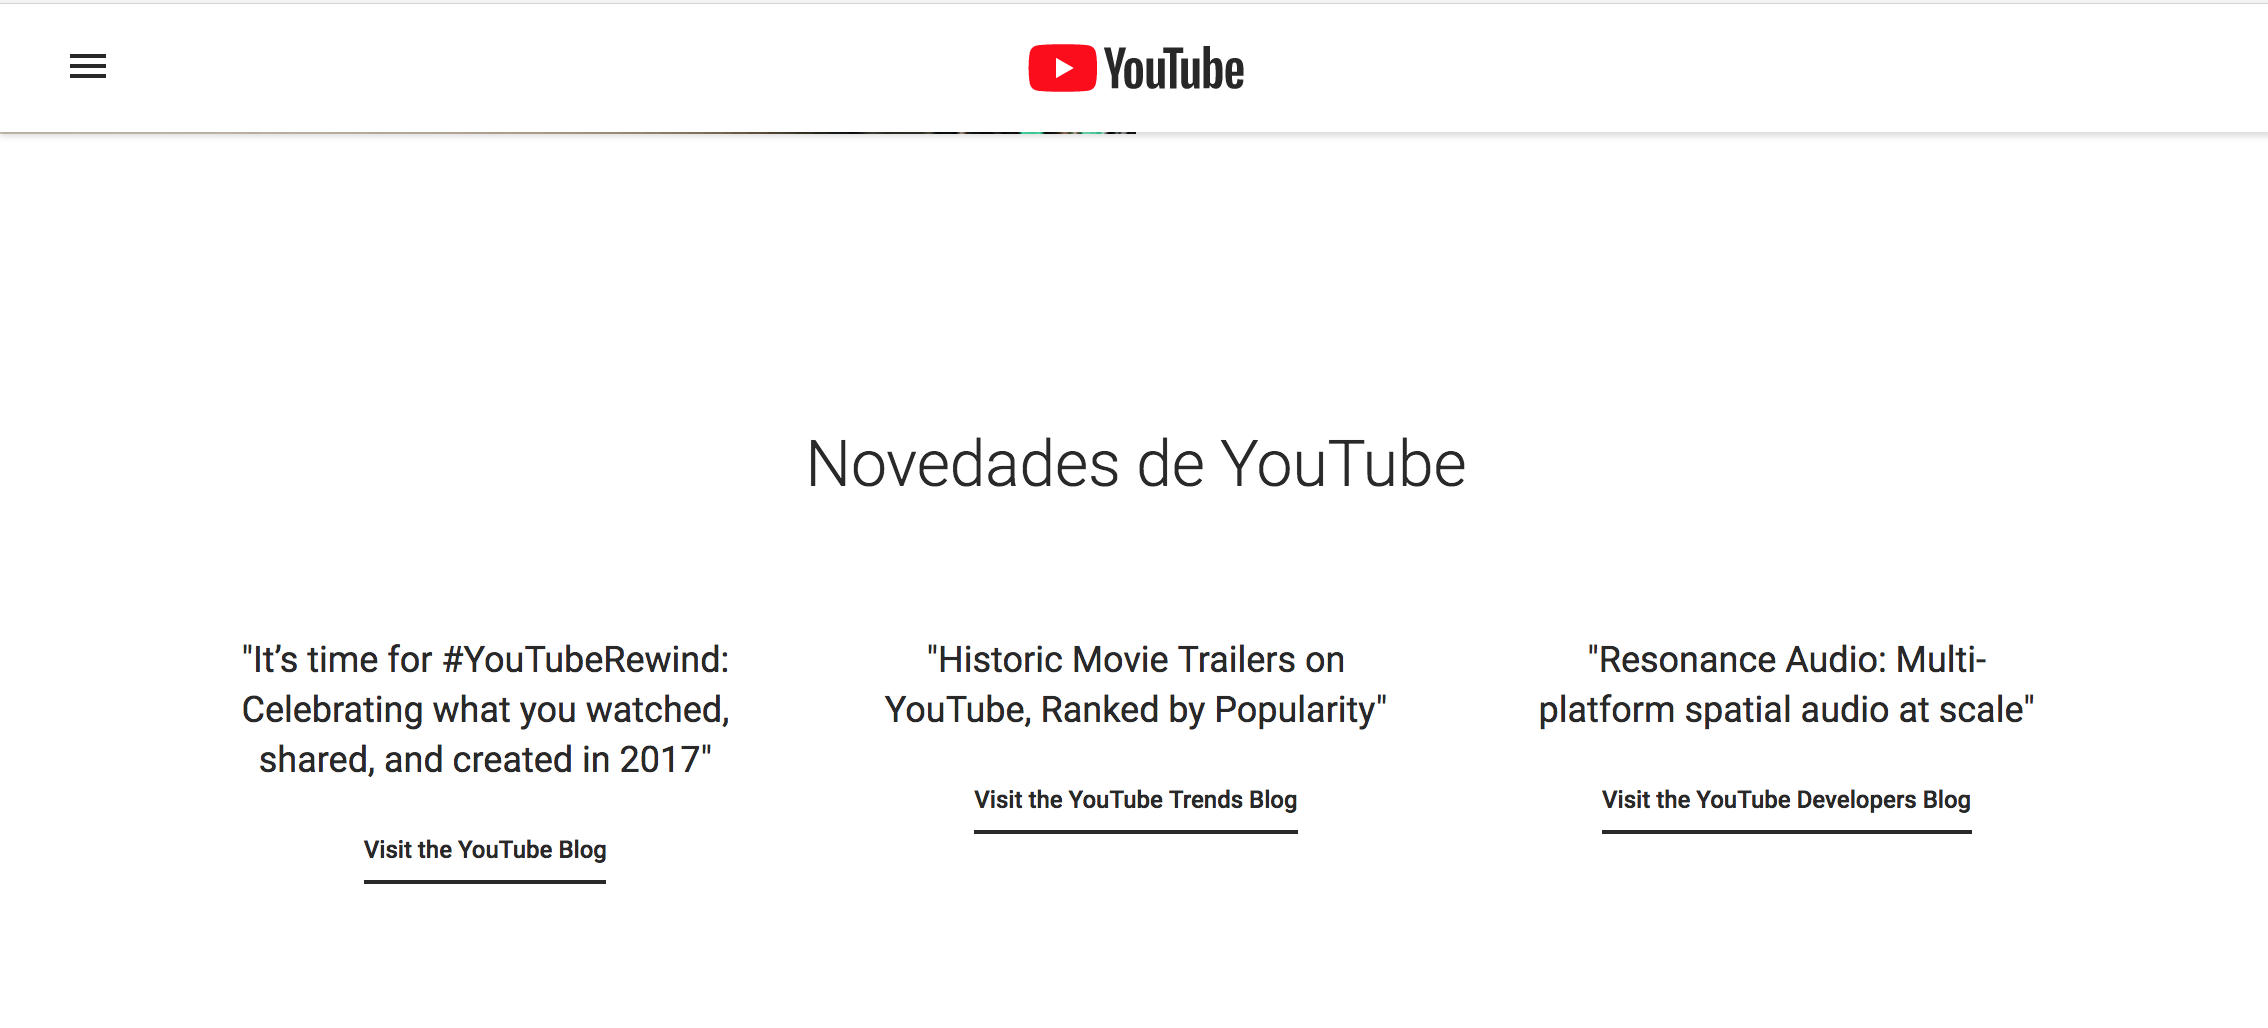 youtube app mas descargada 2017.png